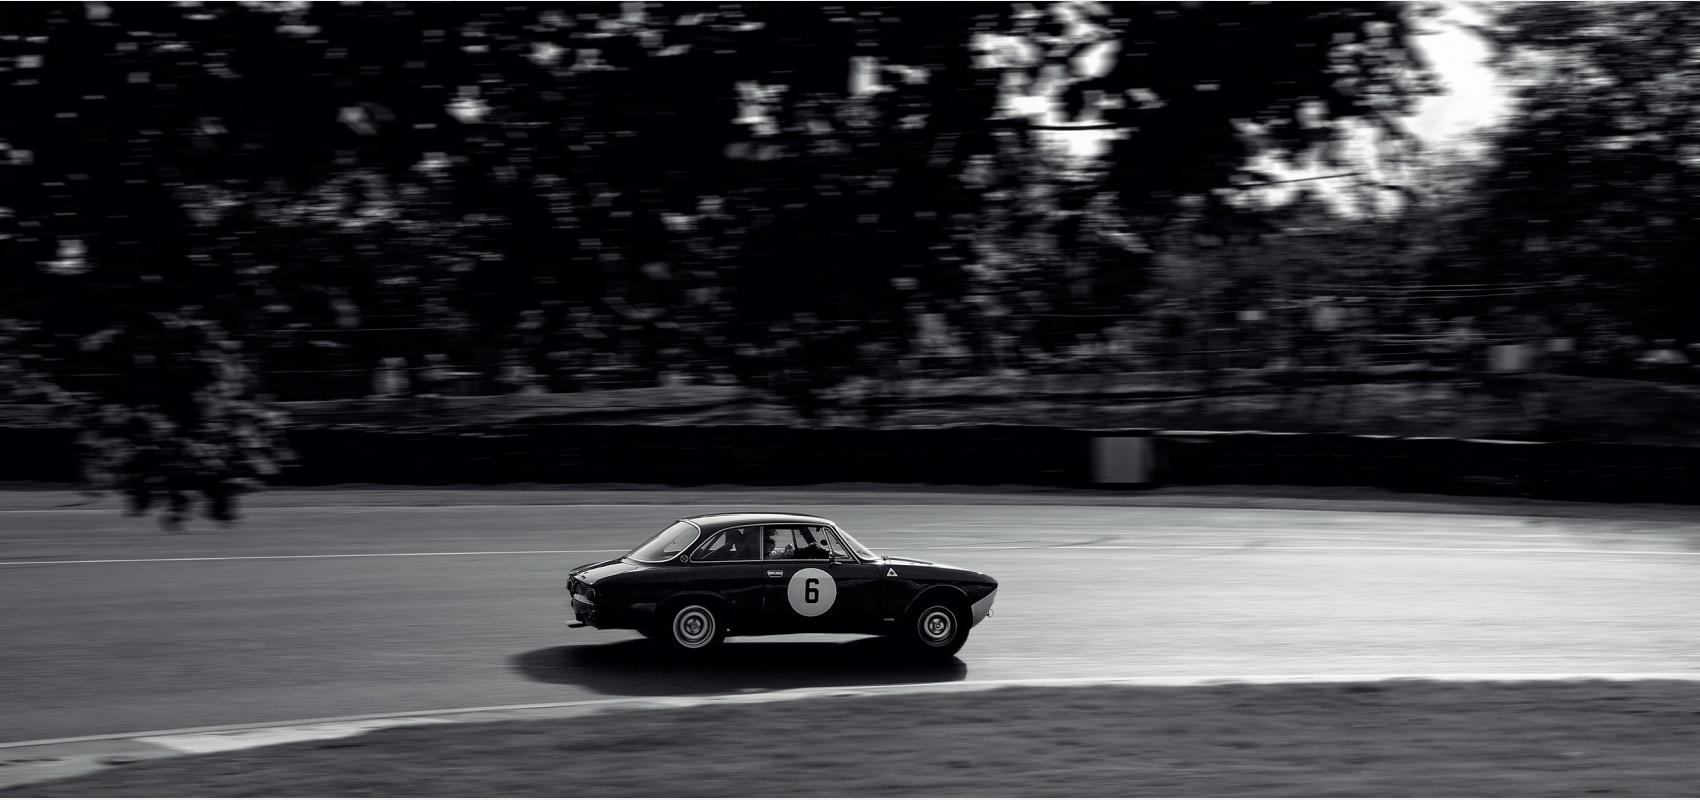 Motorsport - Alfa Romeo Owners Club racing series AROC, Alfa Romeo Giulia 105 GT Sprint